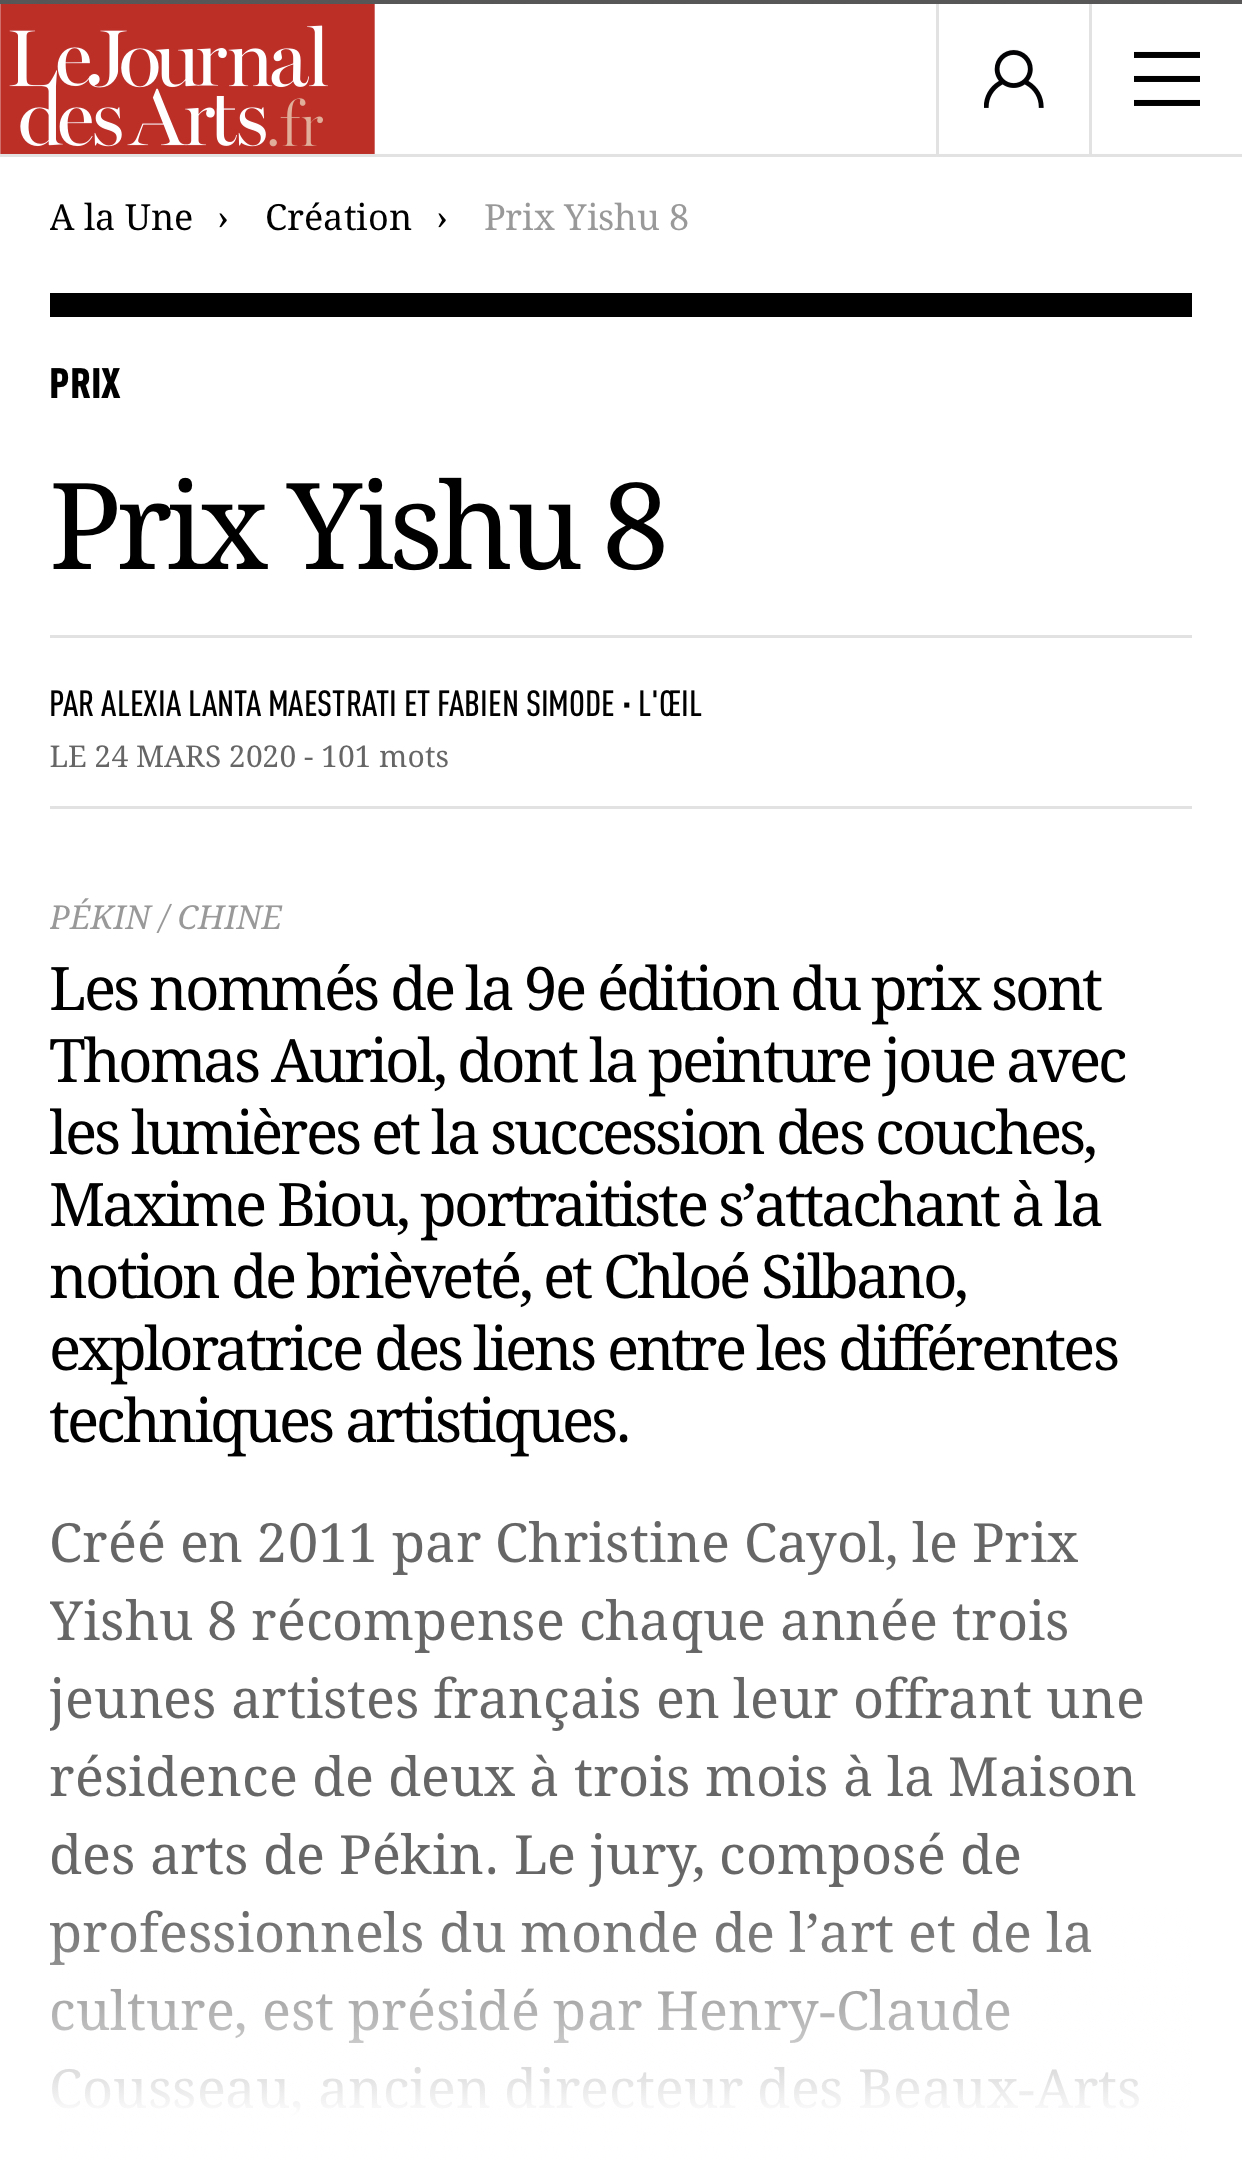 Le Journal des Arts : Prix Yishu 8